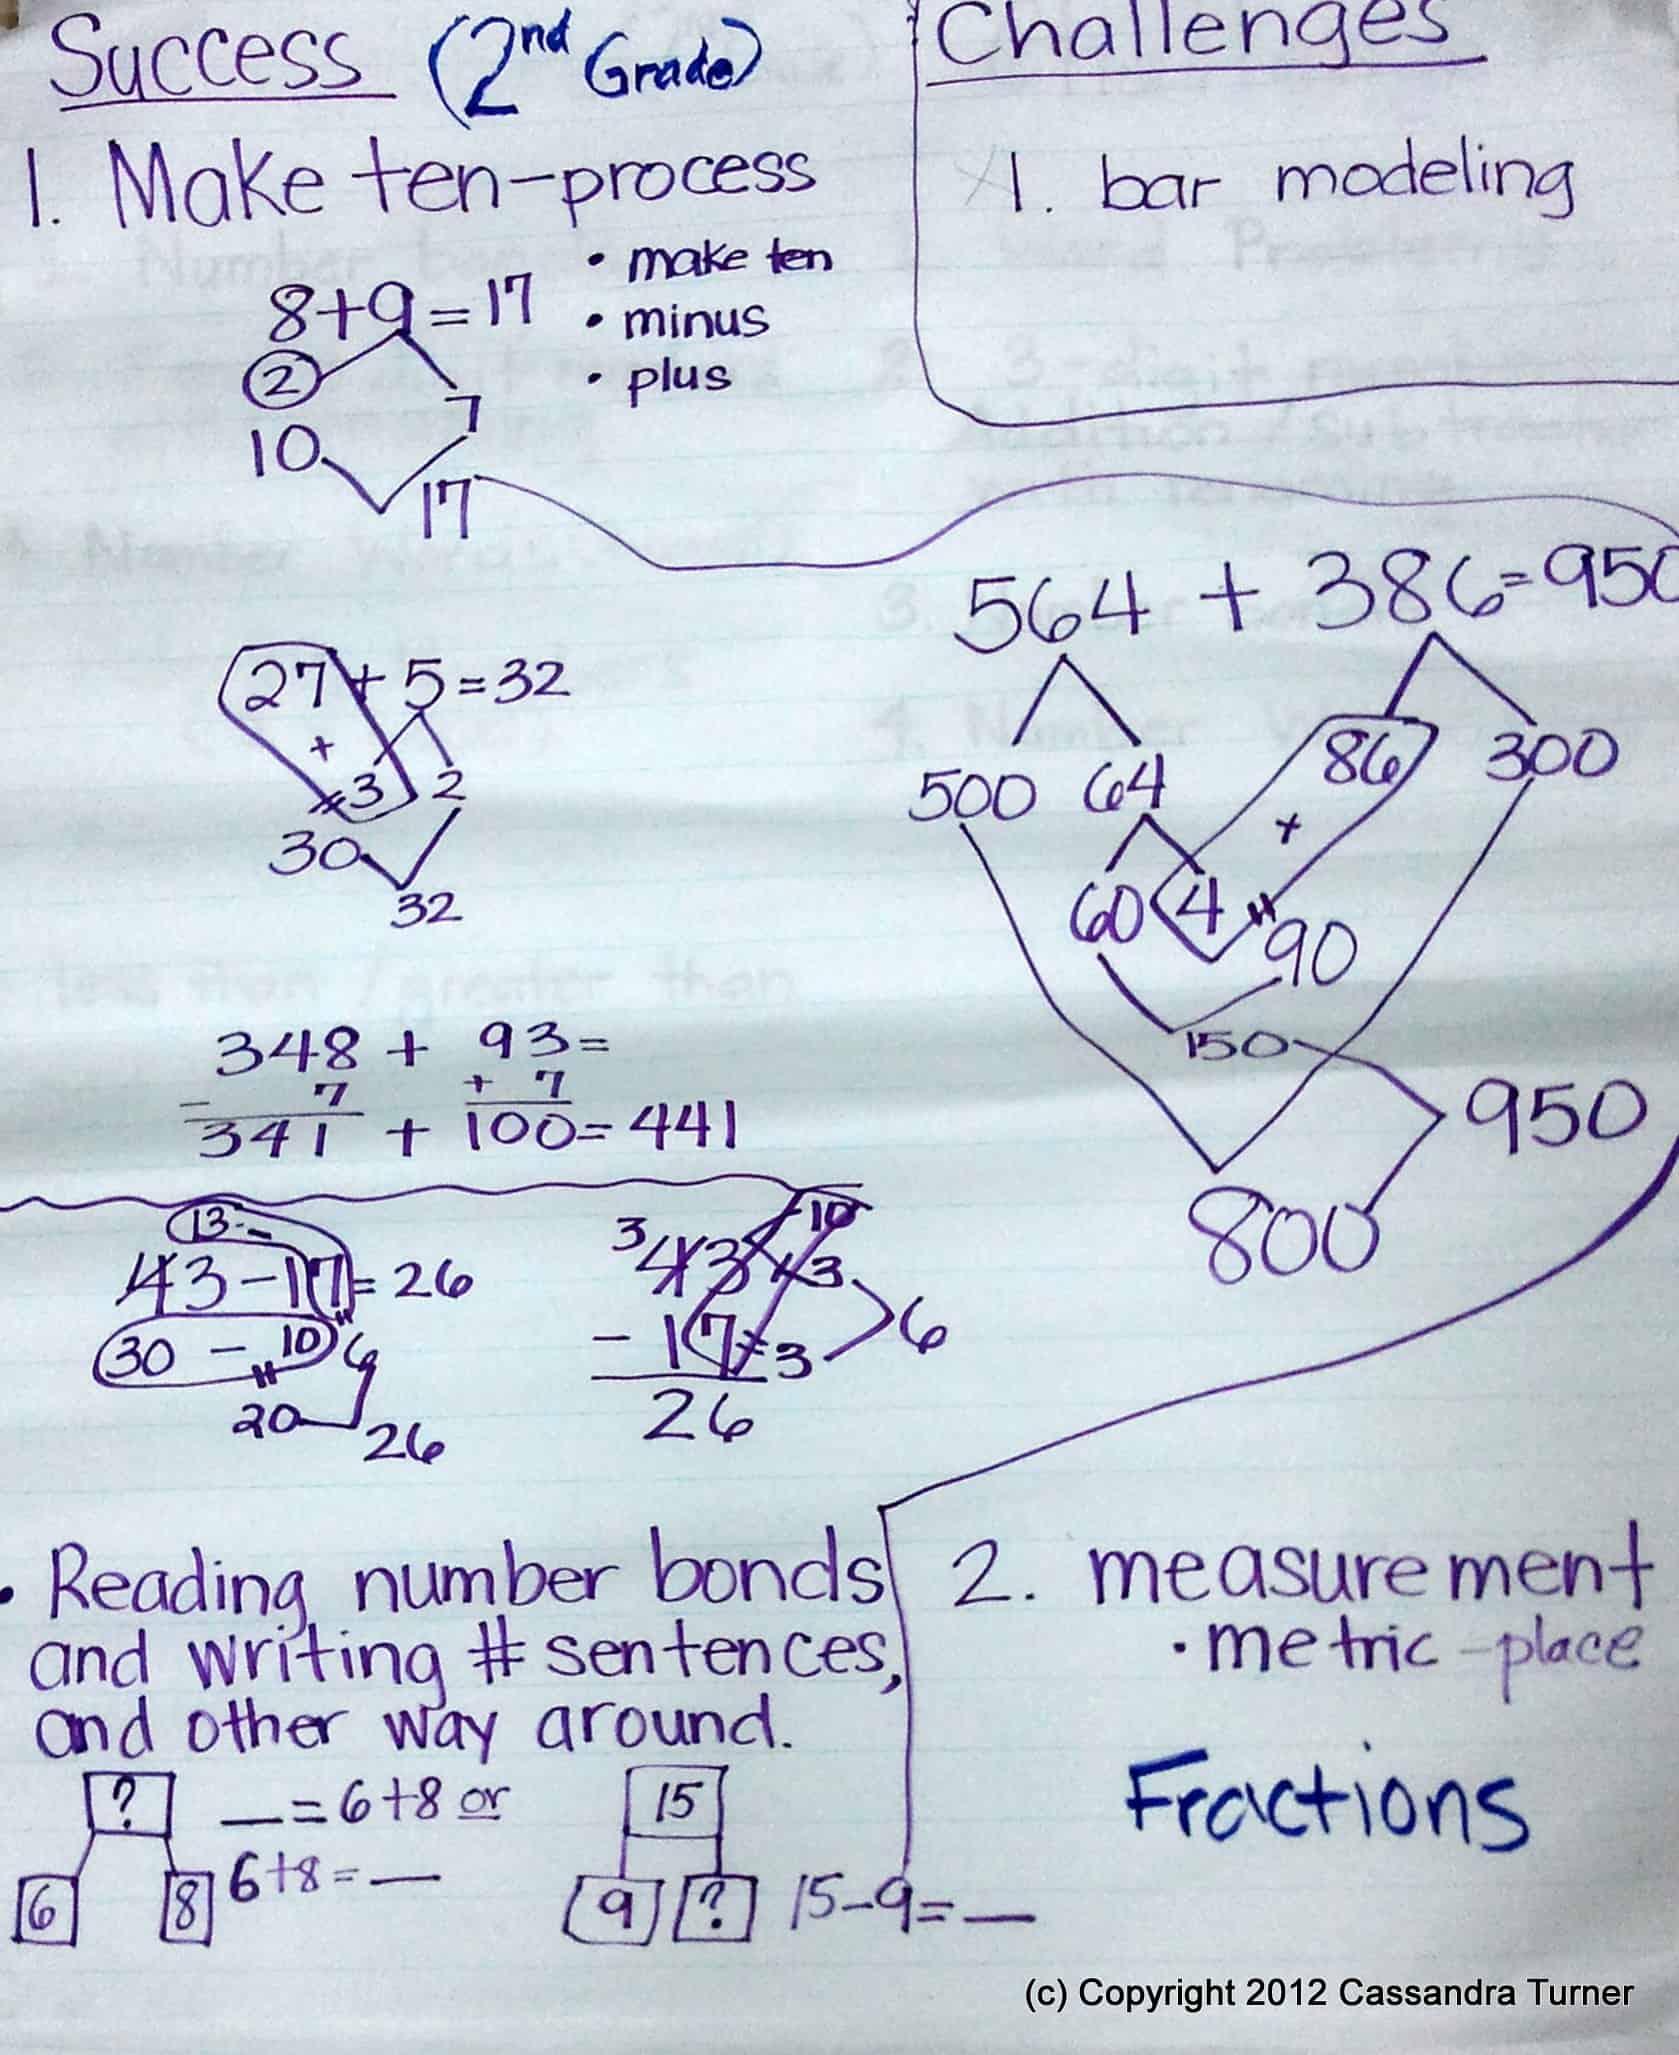 Adopting Singapore Math - Challenges and Successes ...